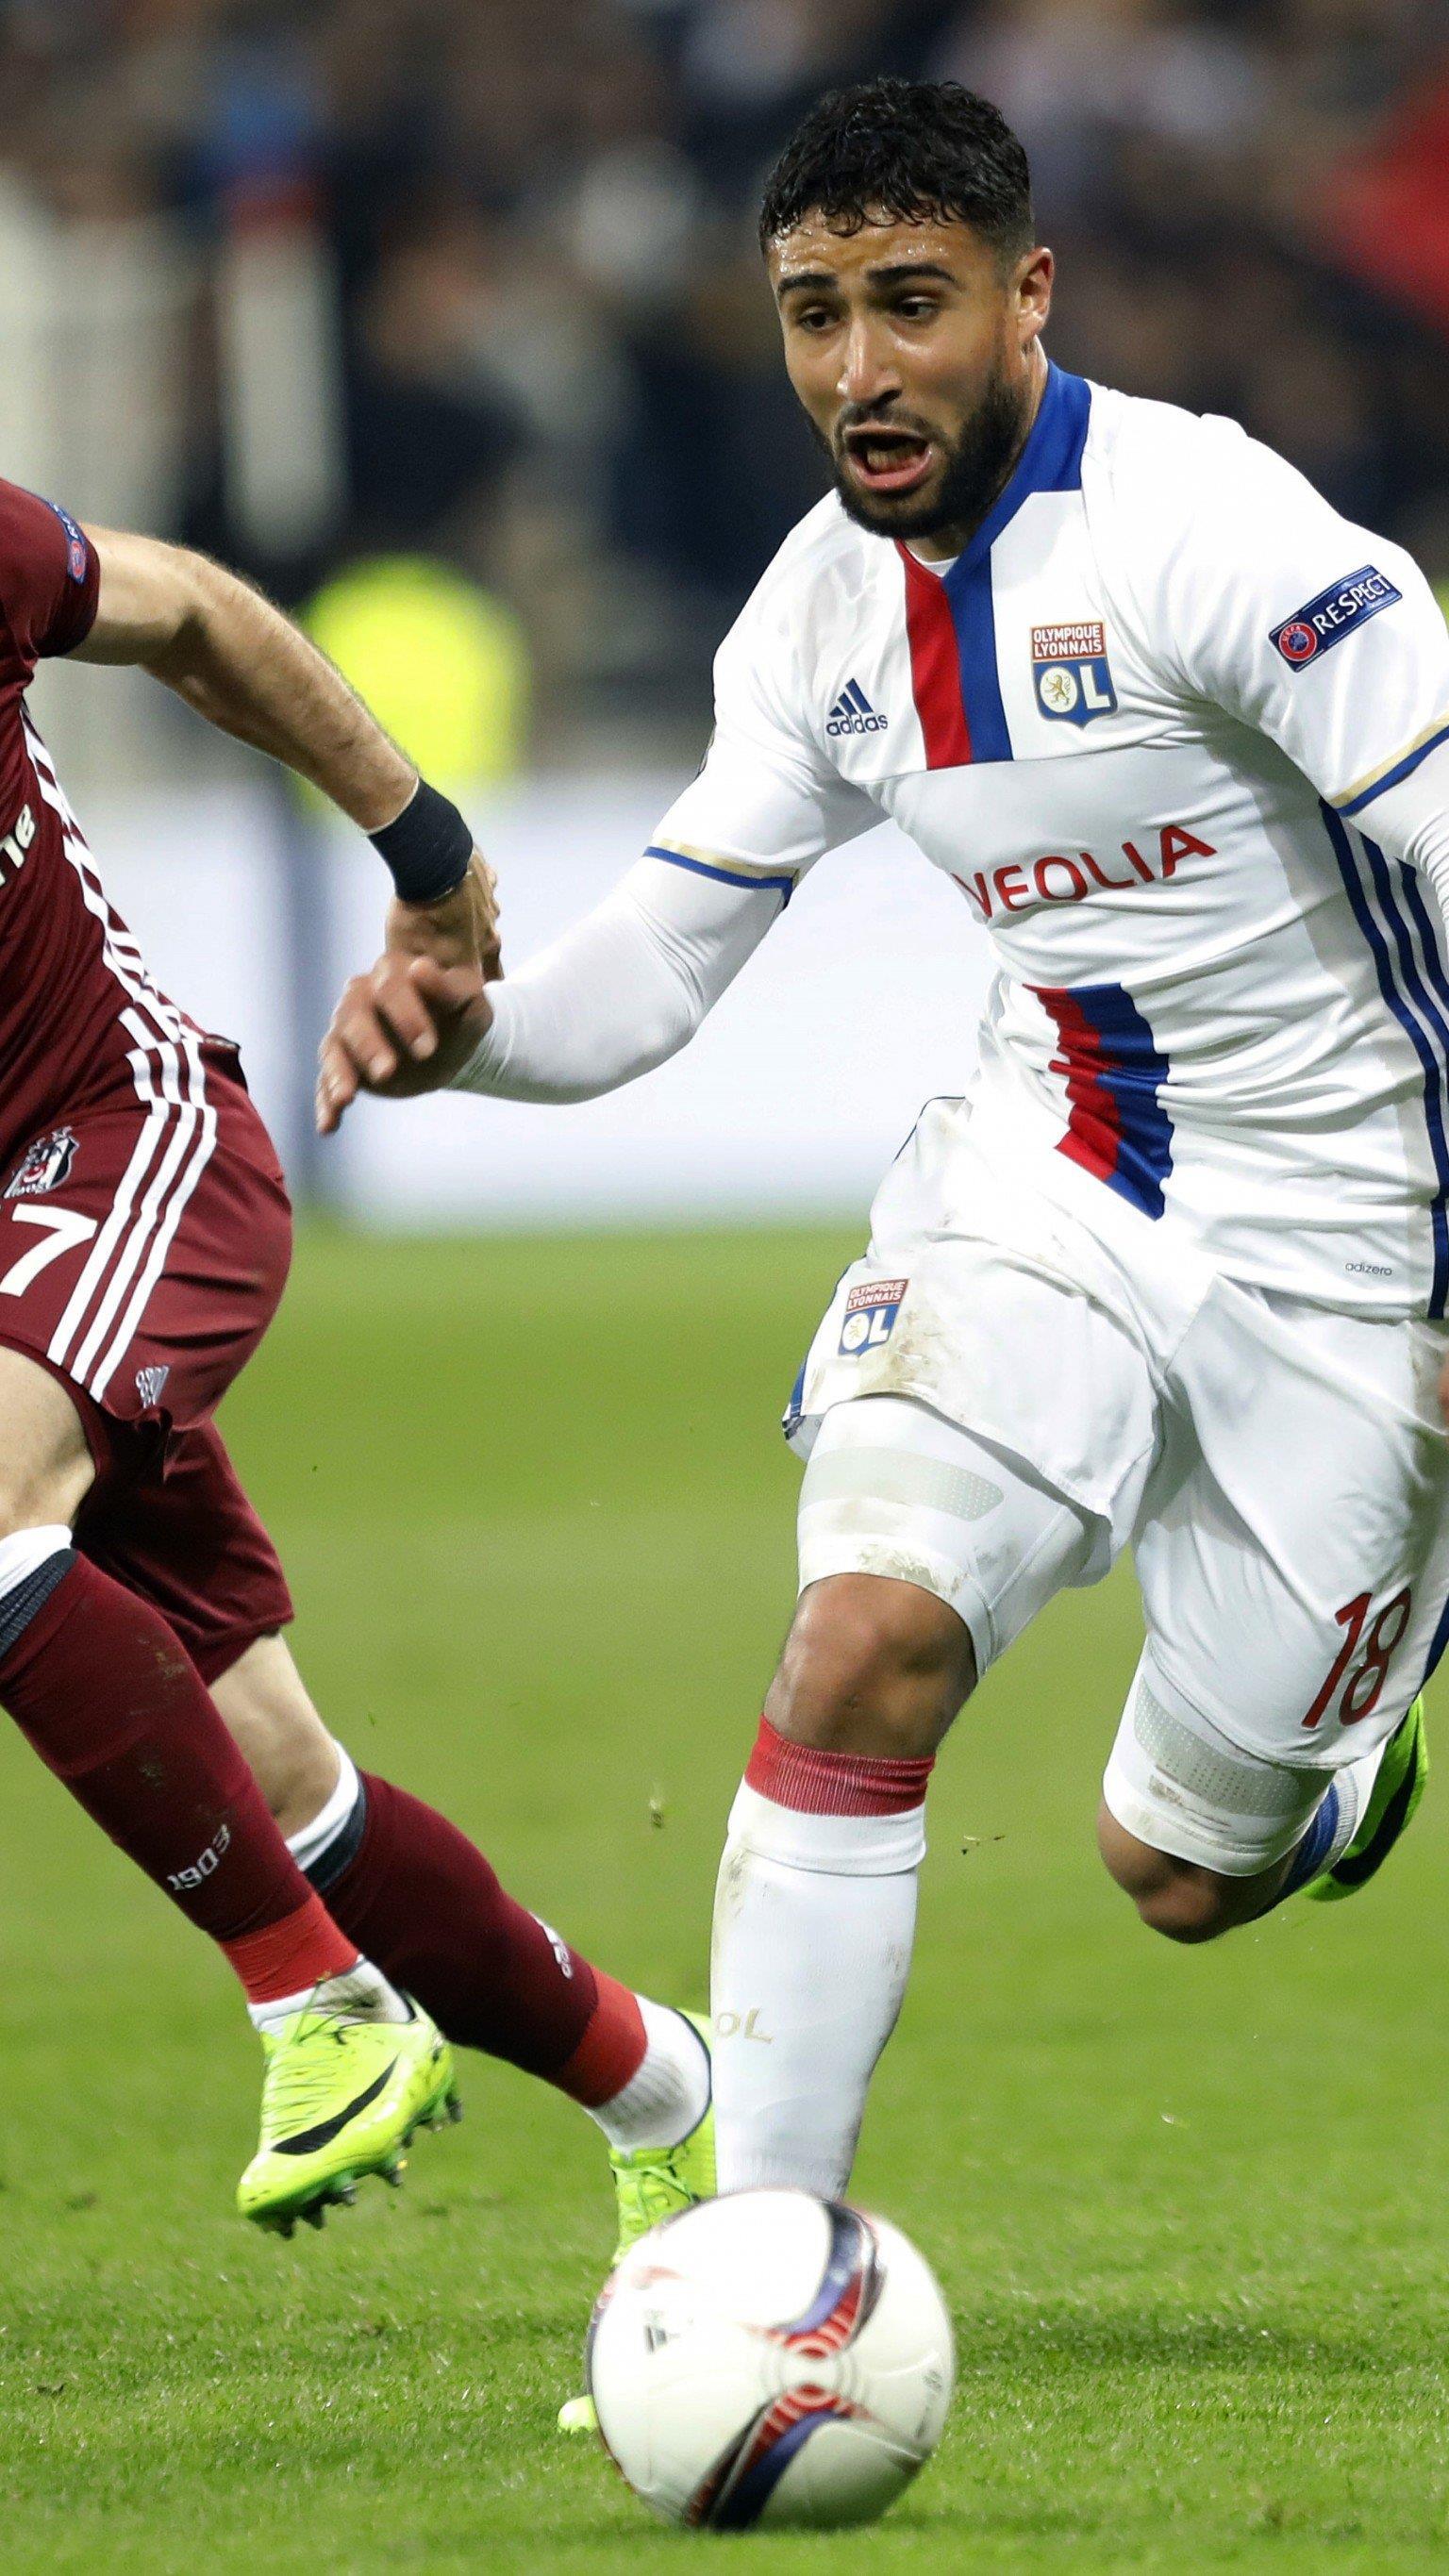 Beşiktaş Istanbul empfängt Olympique Lyon im EL-Viertelfinal-Rückspiel am späten Donnerstagabend.